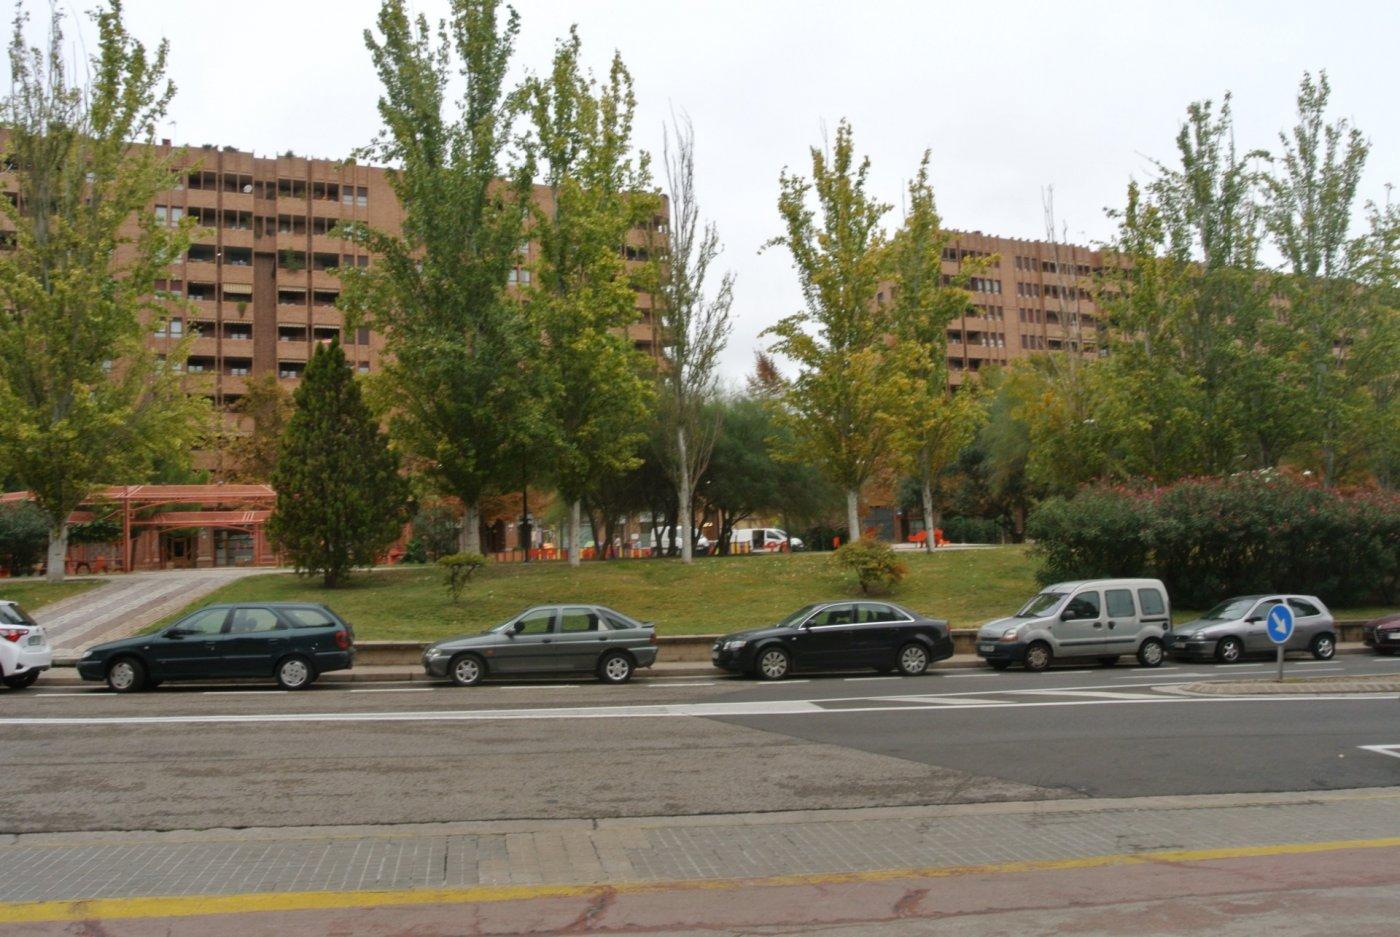 Plaza de garaje en tenor fleta - imagenInmueble5